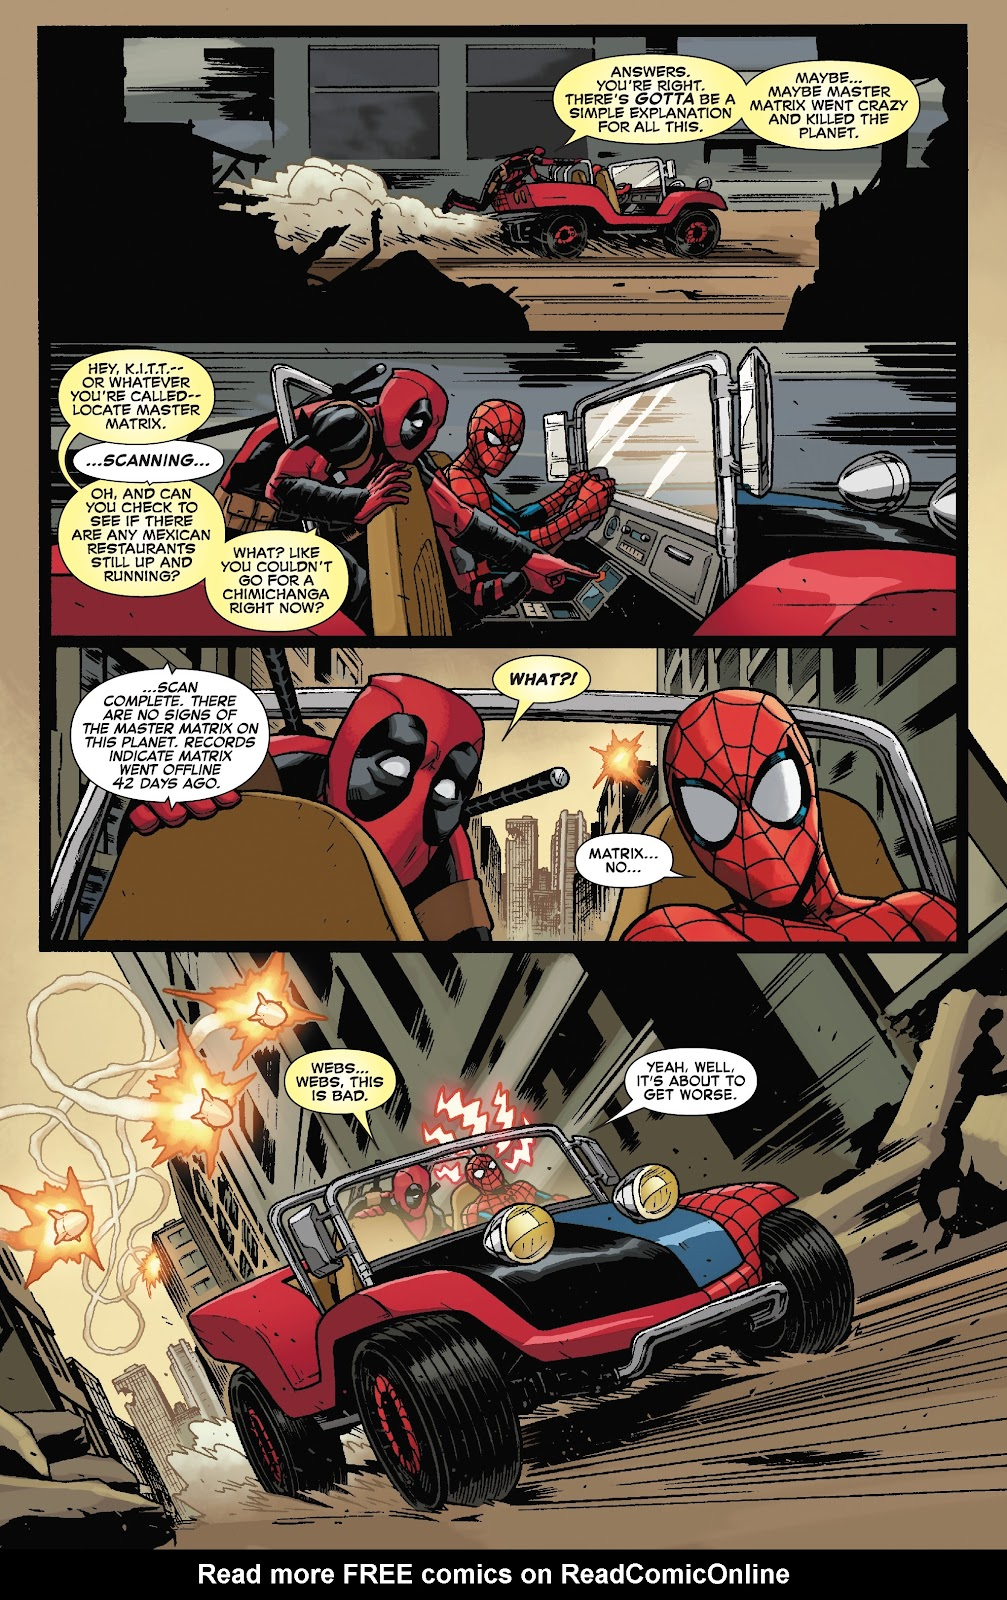 Read online Spider-Man/Deadpool comic -  Issue #46 - 10